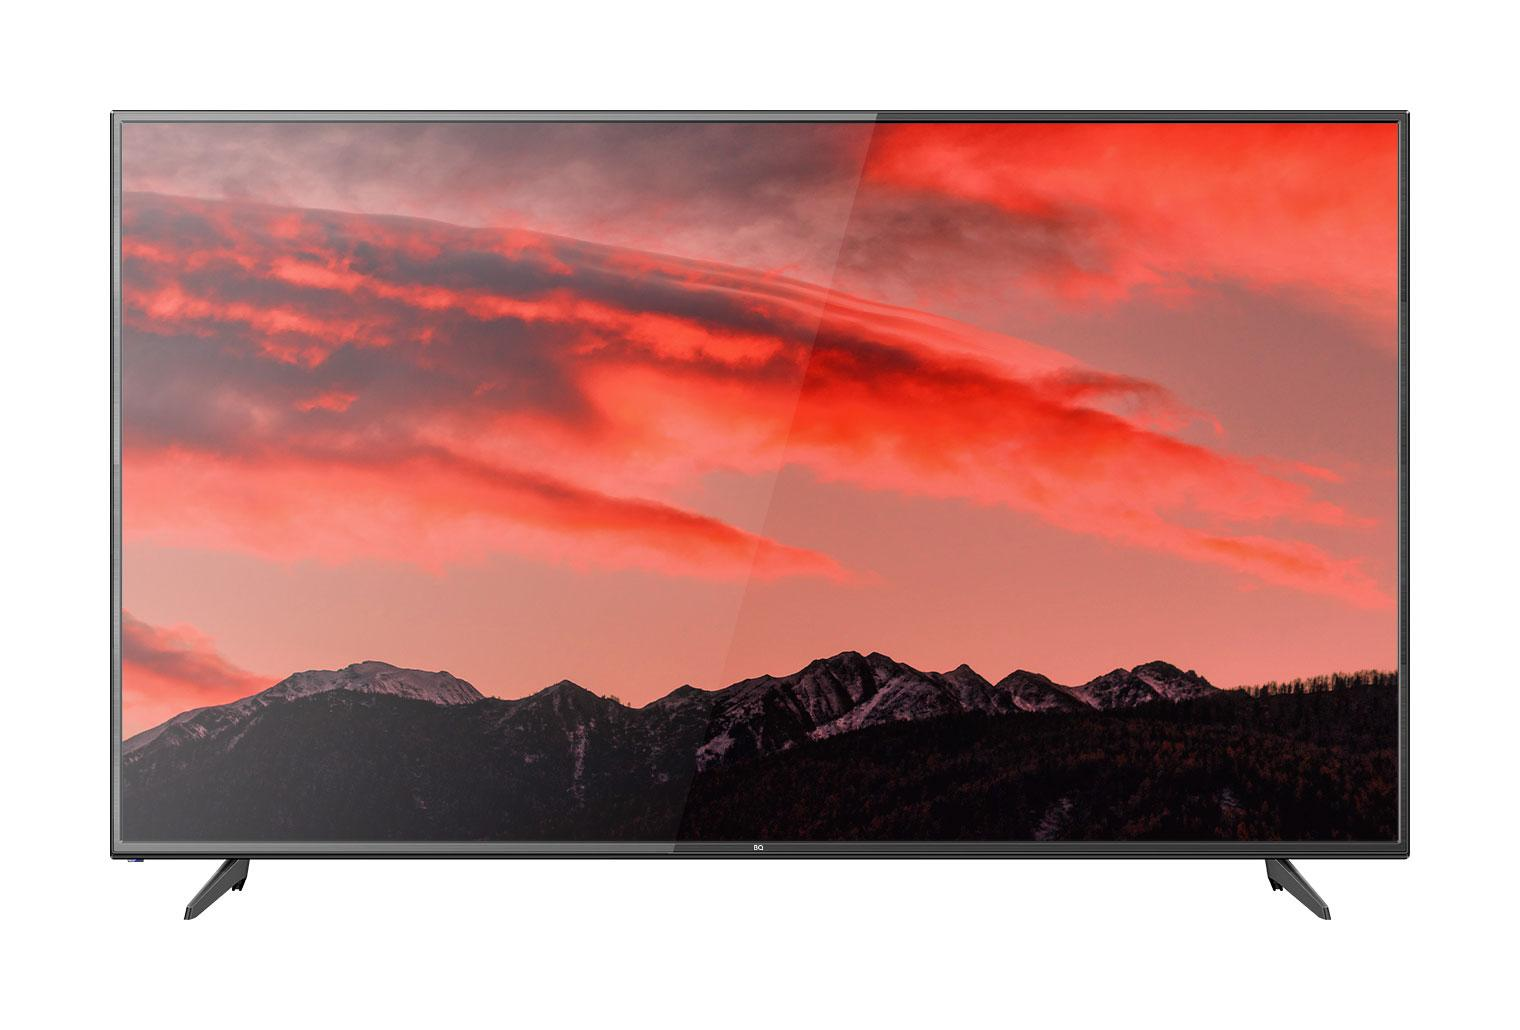 BQ65SU01B — Первый 4K телевизор бренда. Уже впродаже